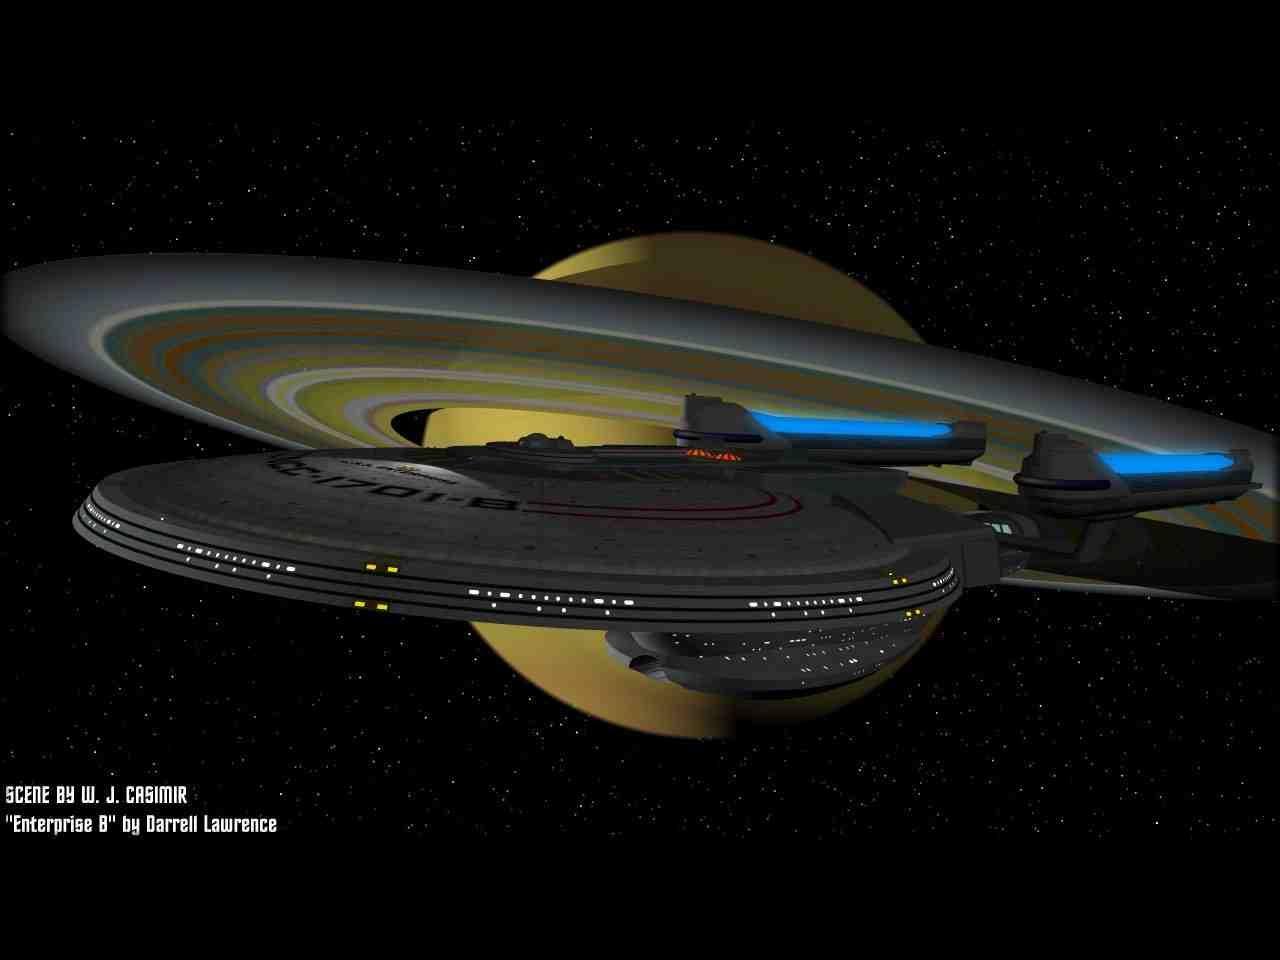 U S S Enterprise Ncc 1701 B With Images Star Trek Wallpaper